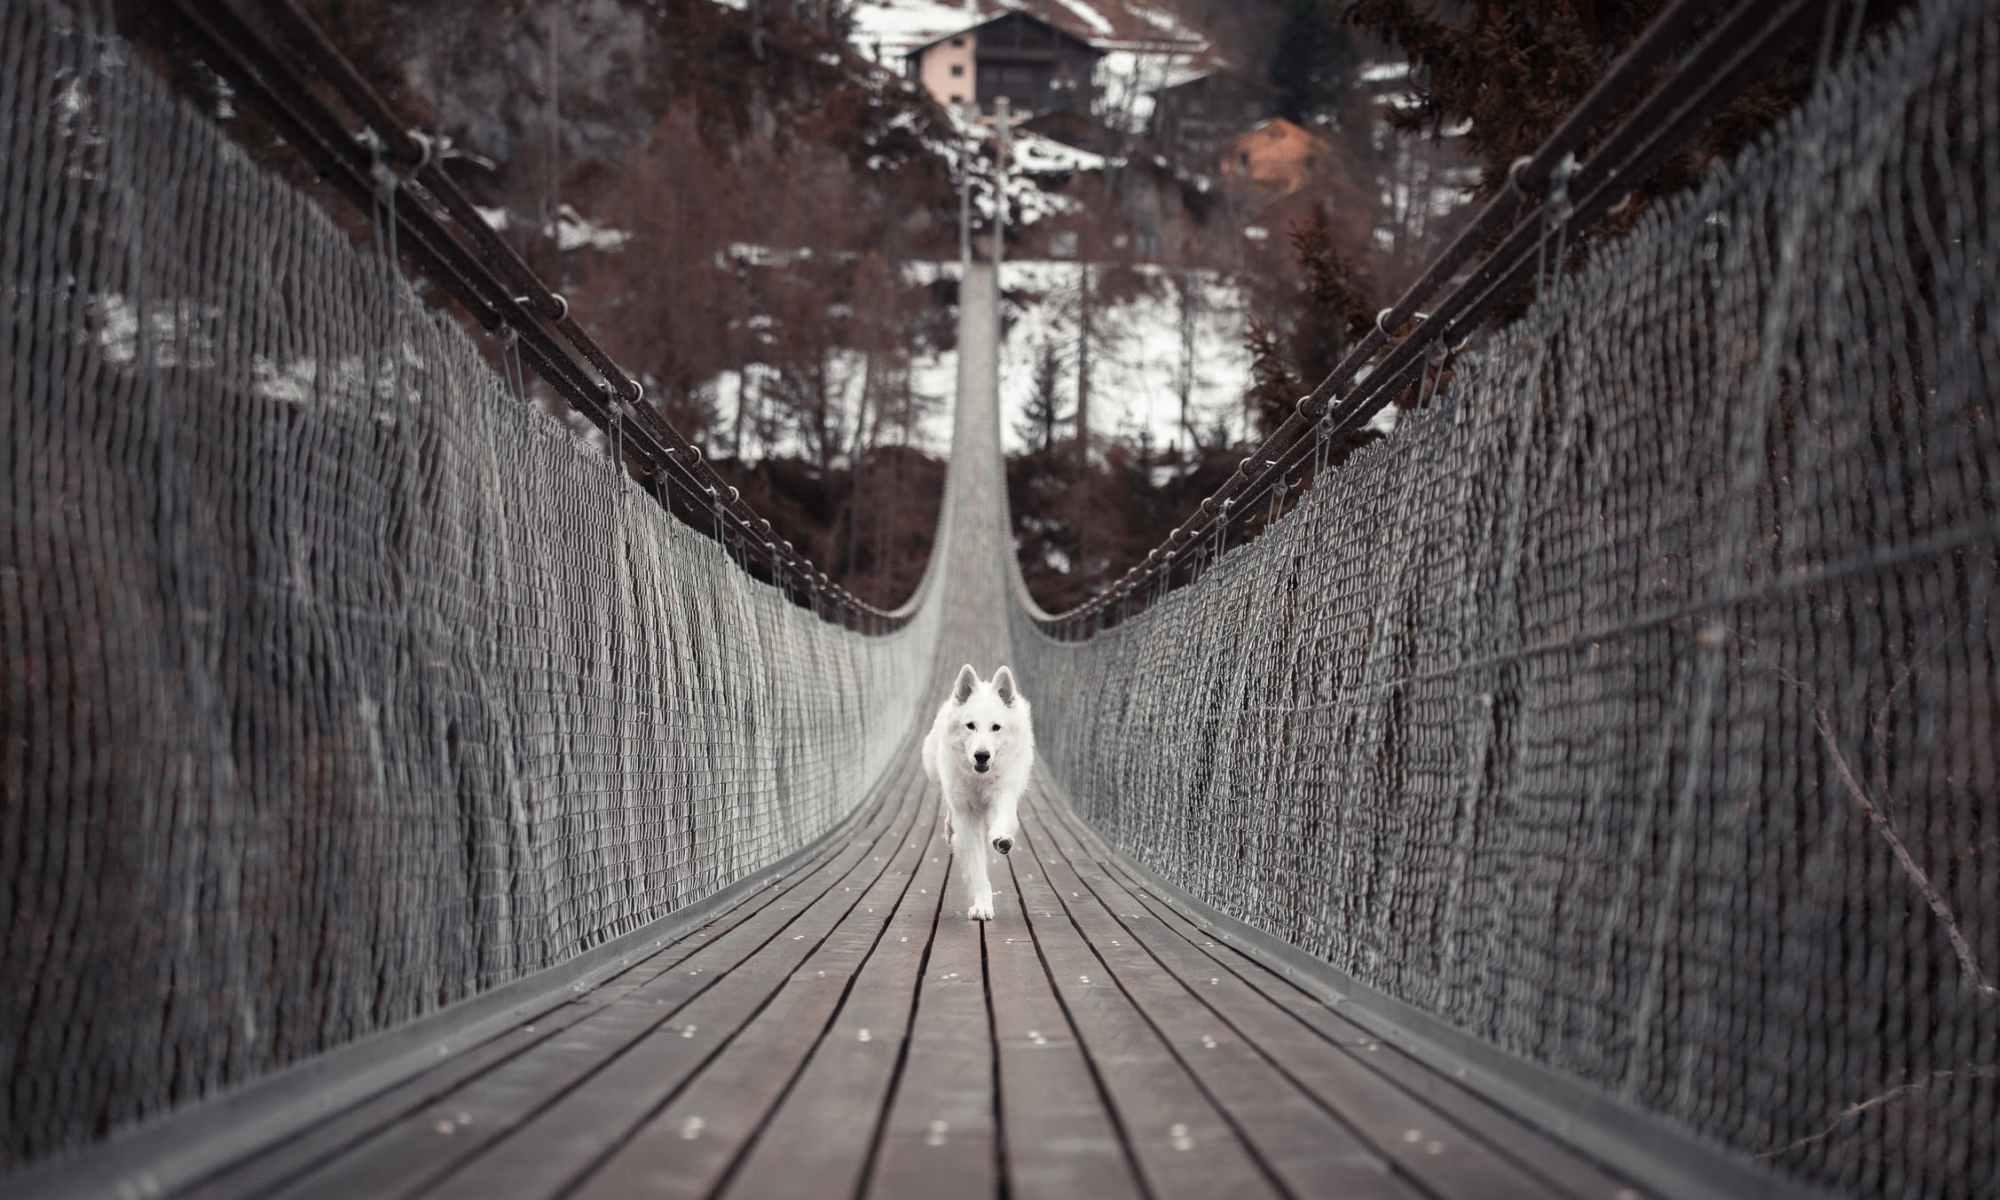 White dog running on narrow wooden bridge